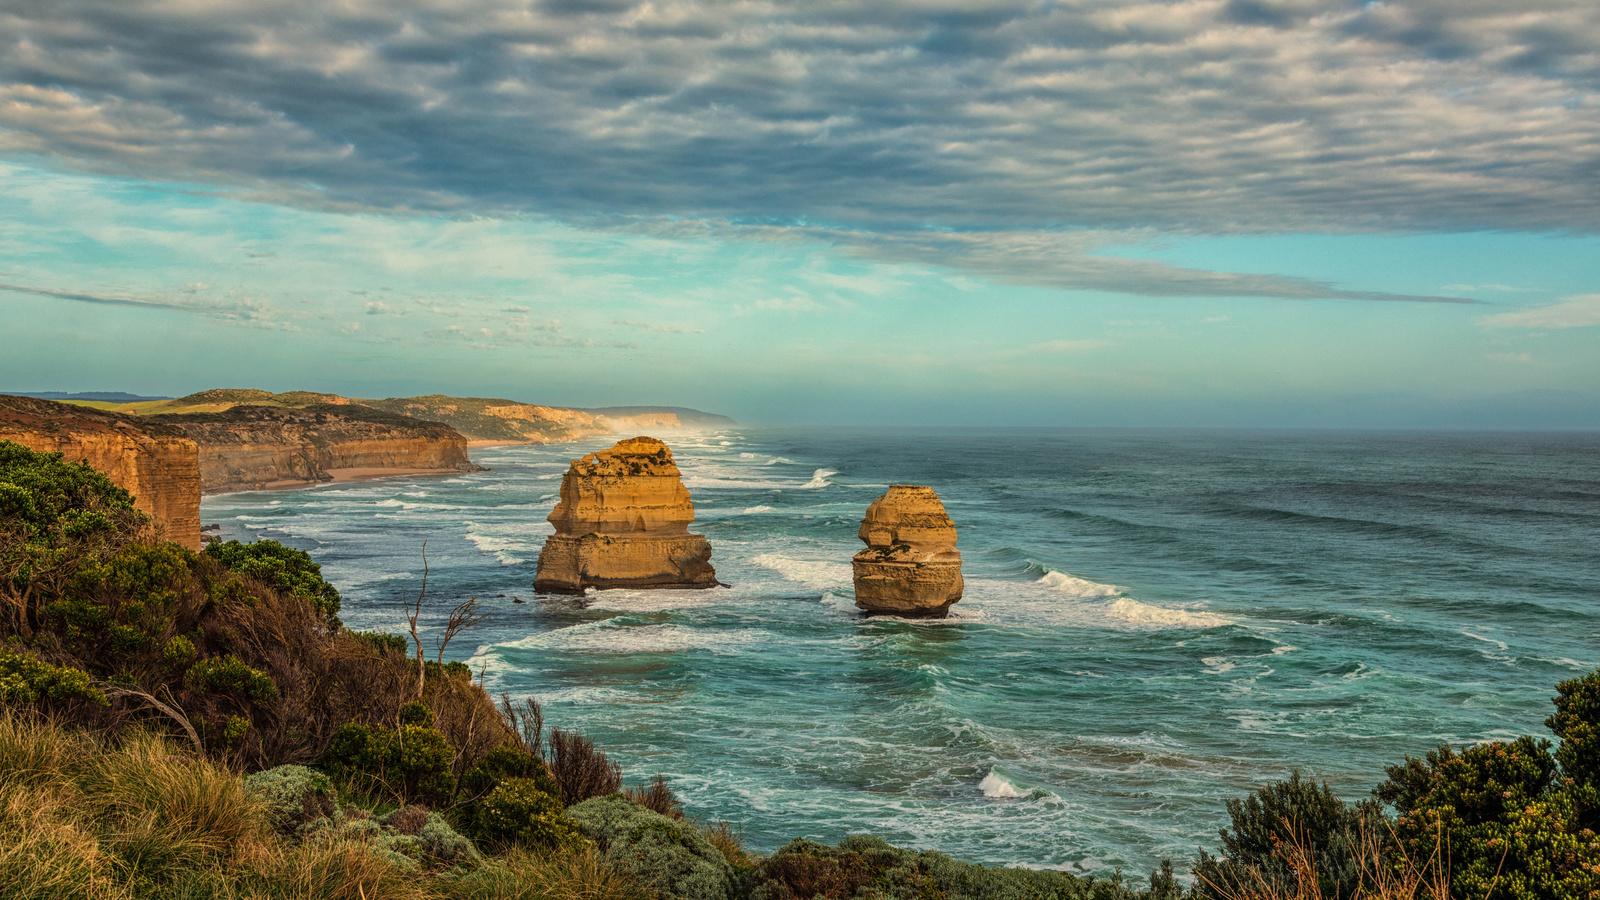 австралия, побережье, princetown, скала, облака, природа